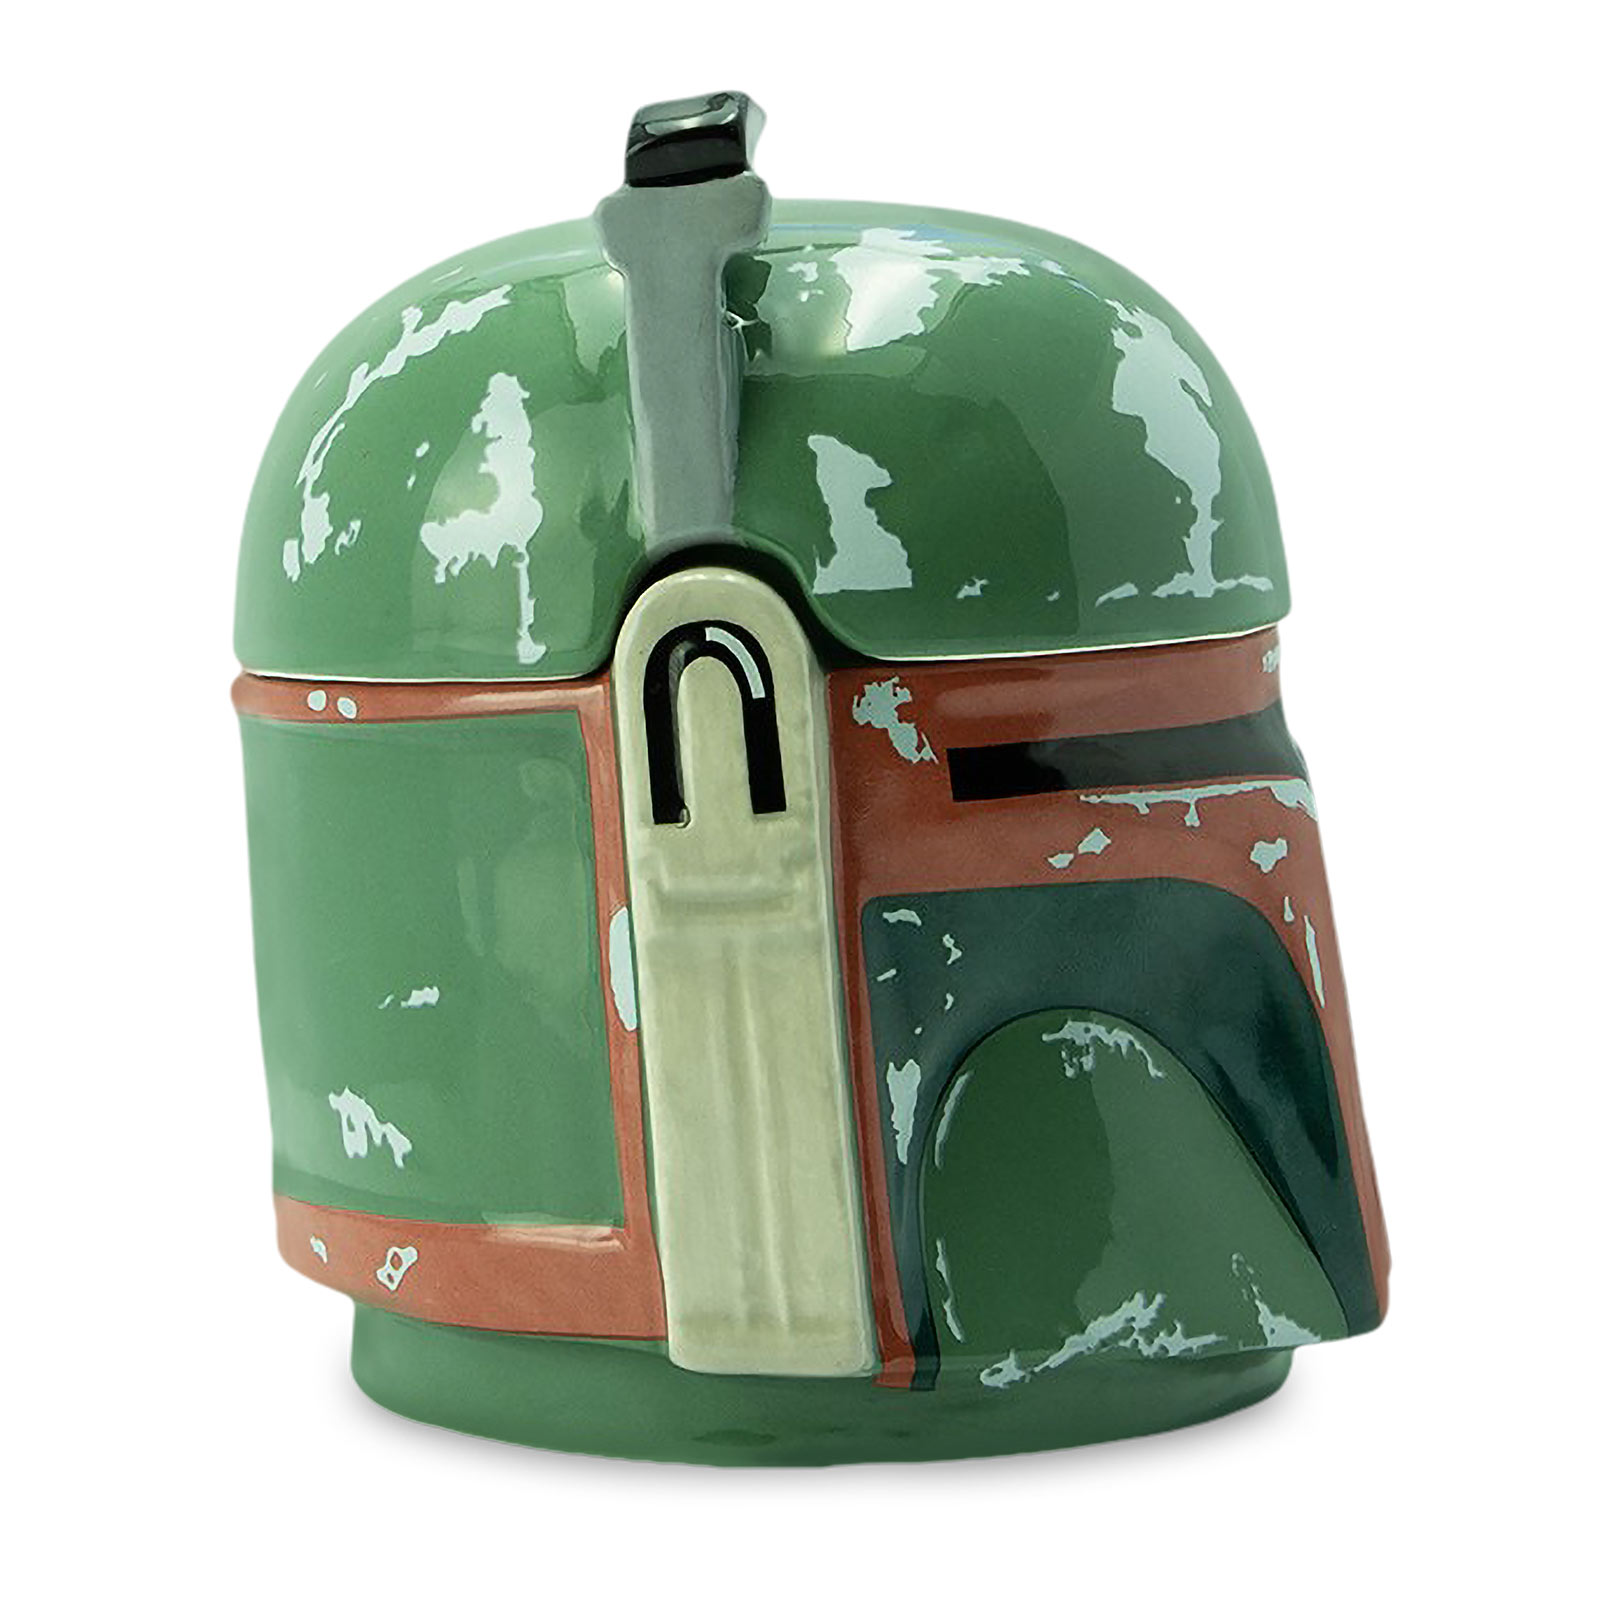 Star Wars - Boba Fett Helm 3D Tasse mit Deckel